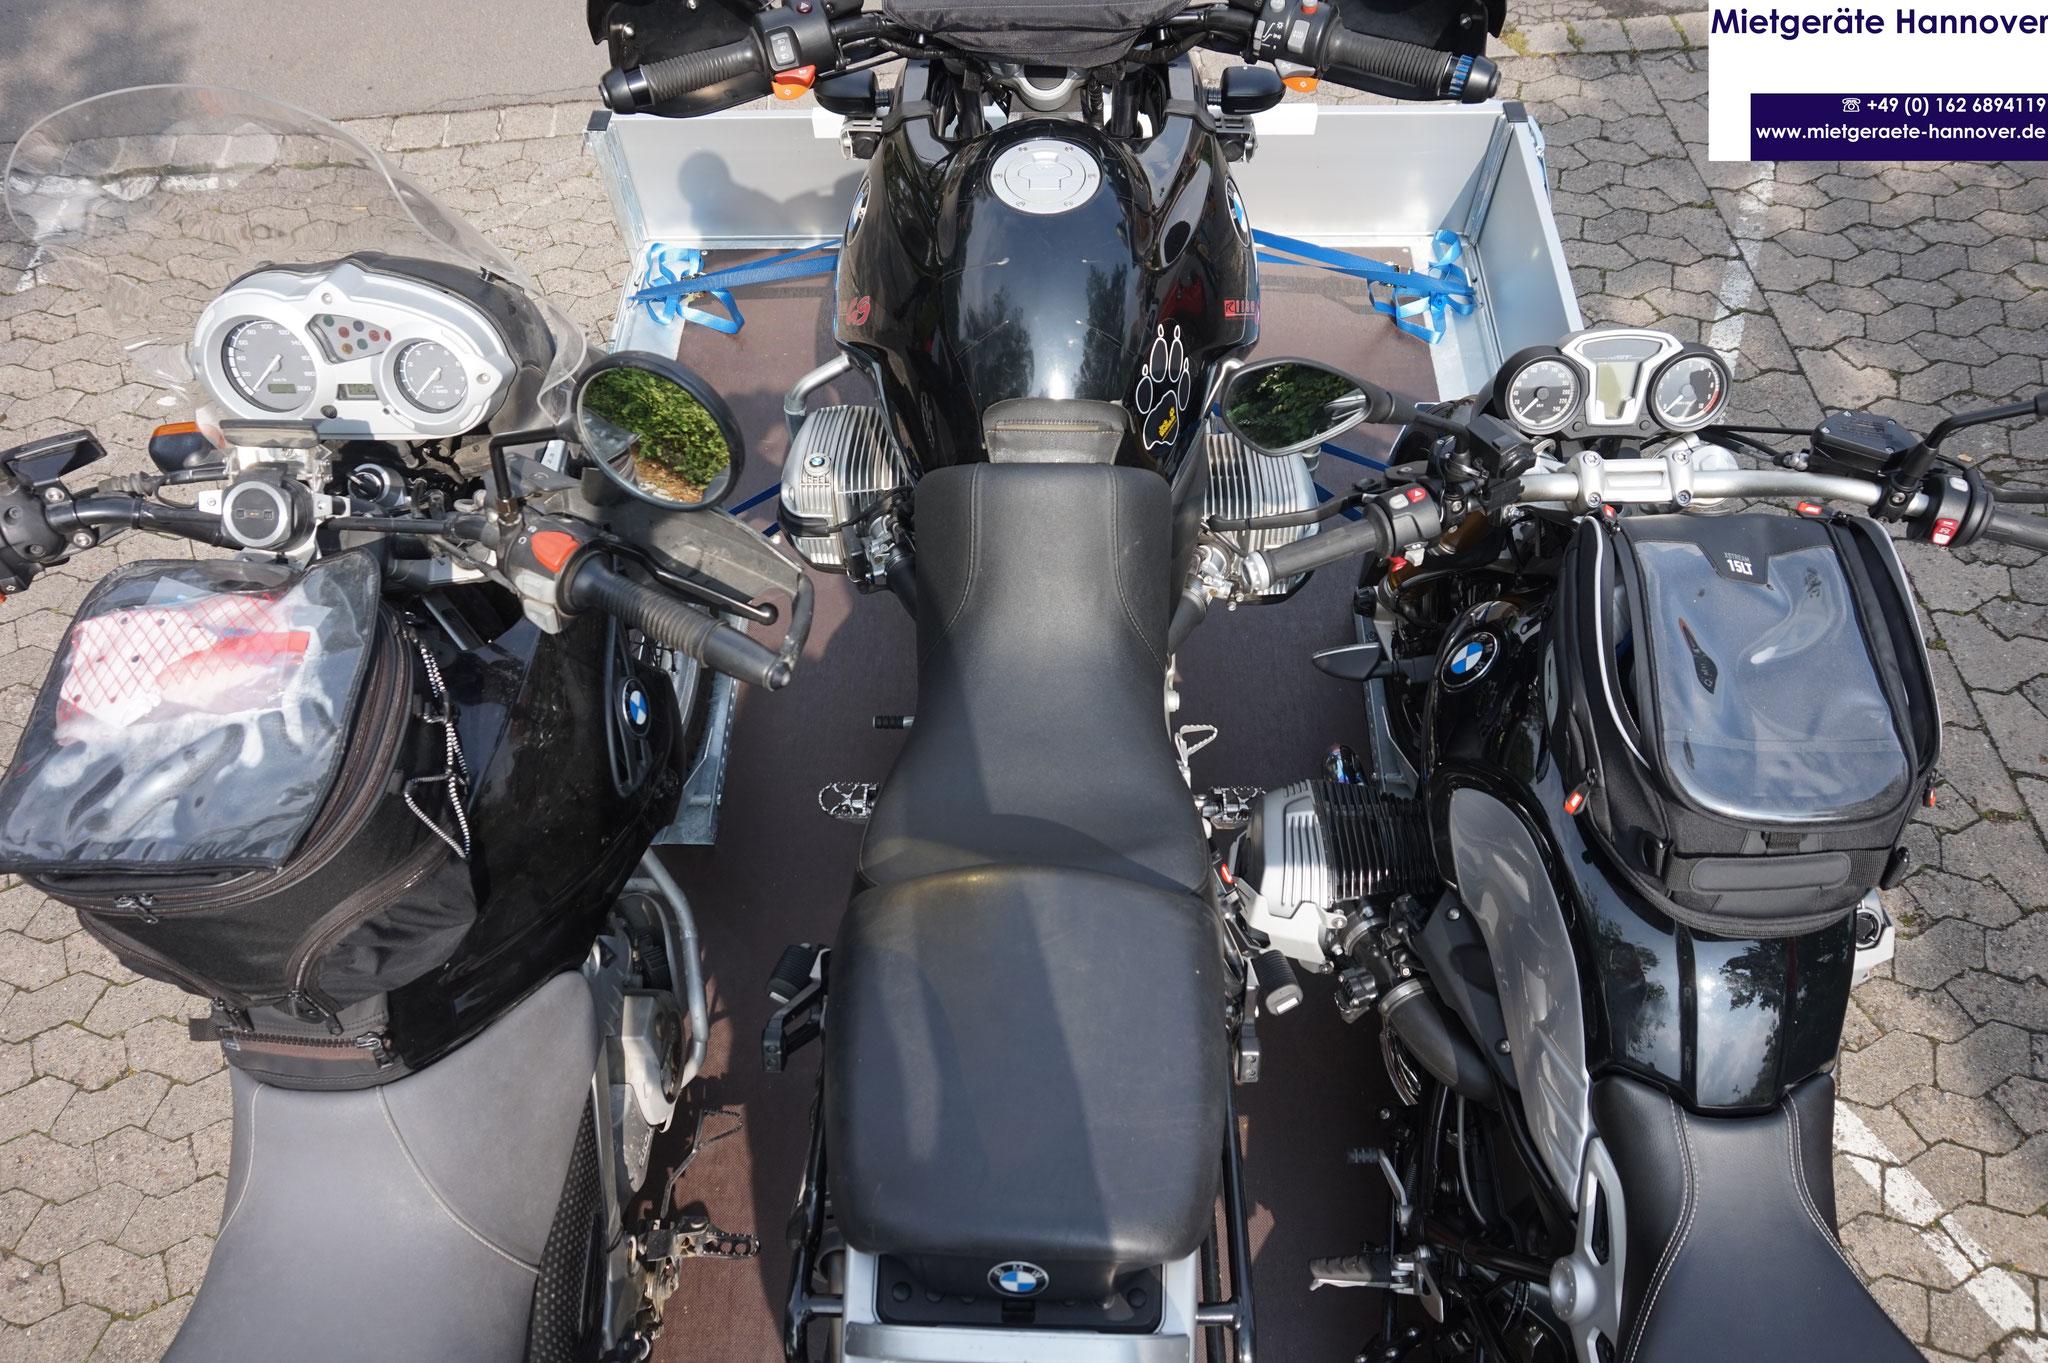 BMW R GS 1250, R nineT, GS 650 oben